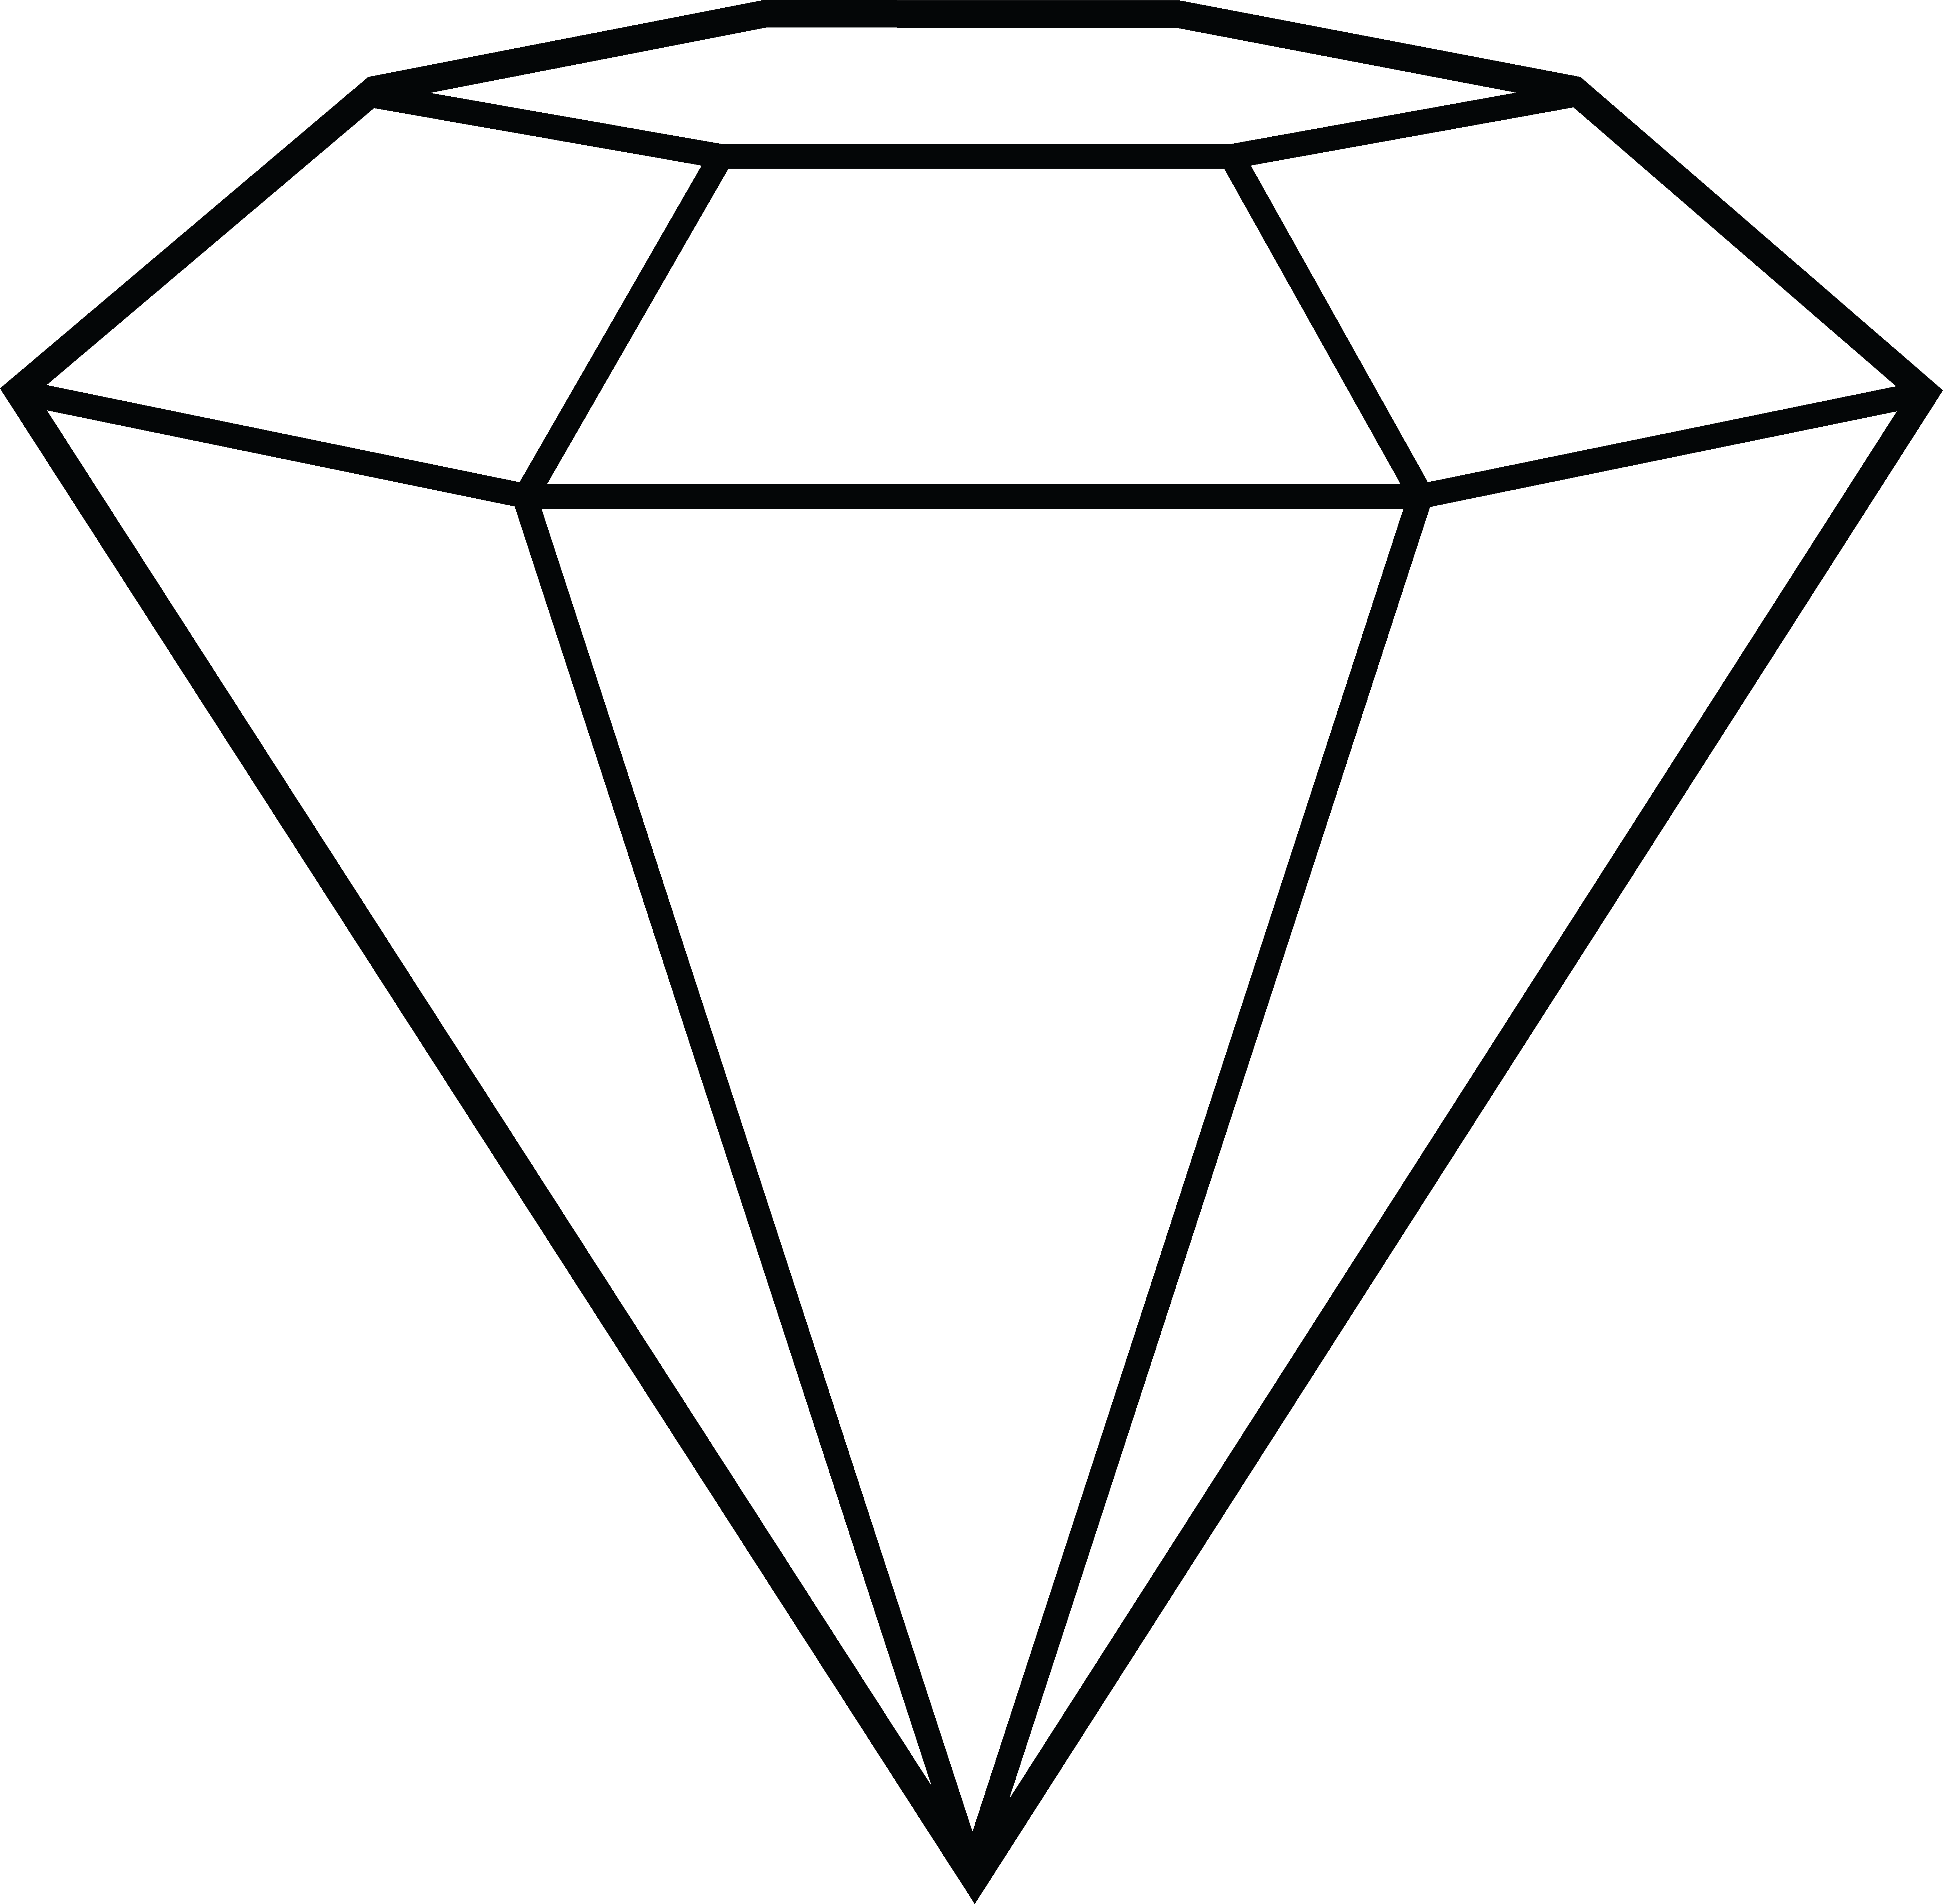 Outline transparent png background. Diamond clipart drawn